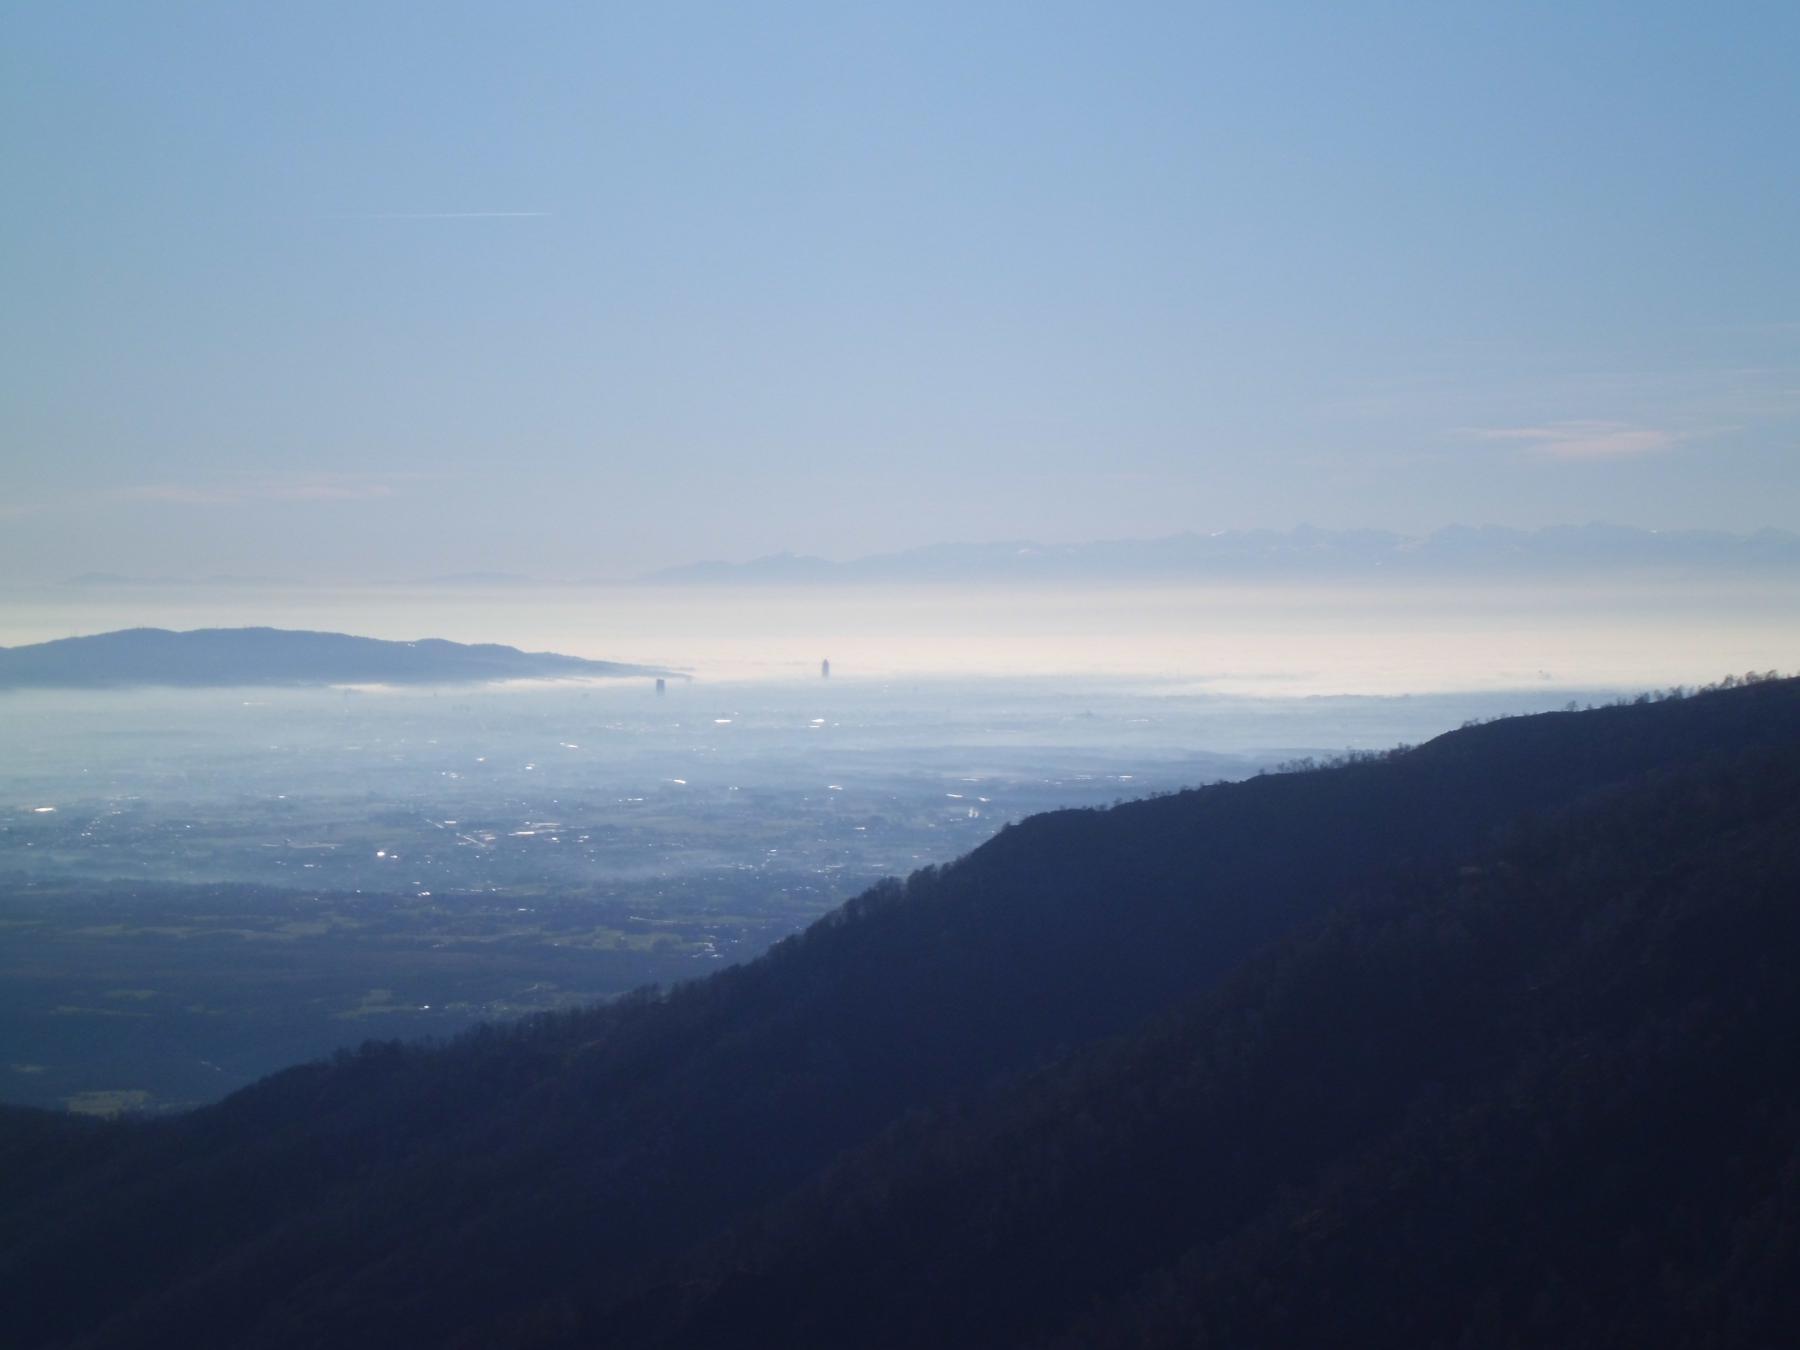 Torino e i due grattacieli